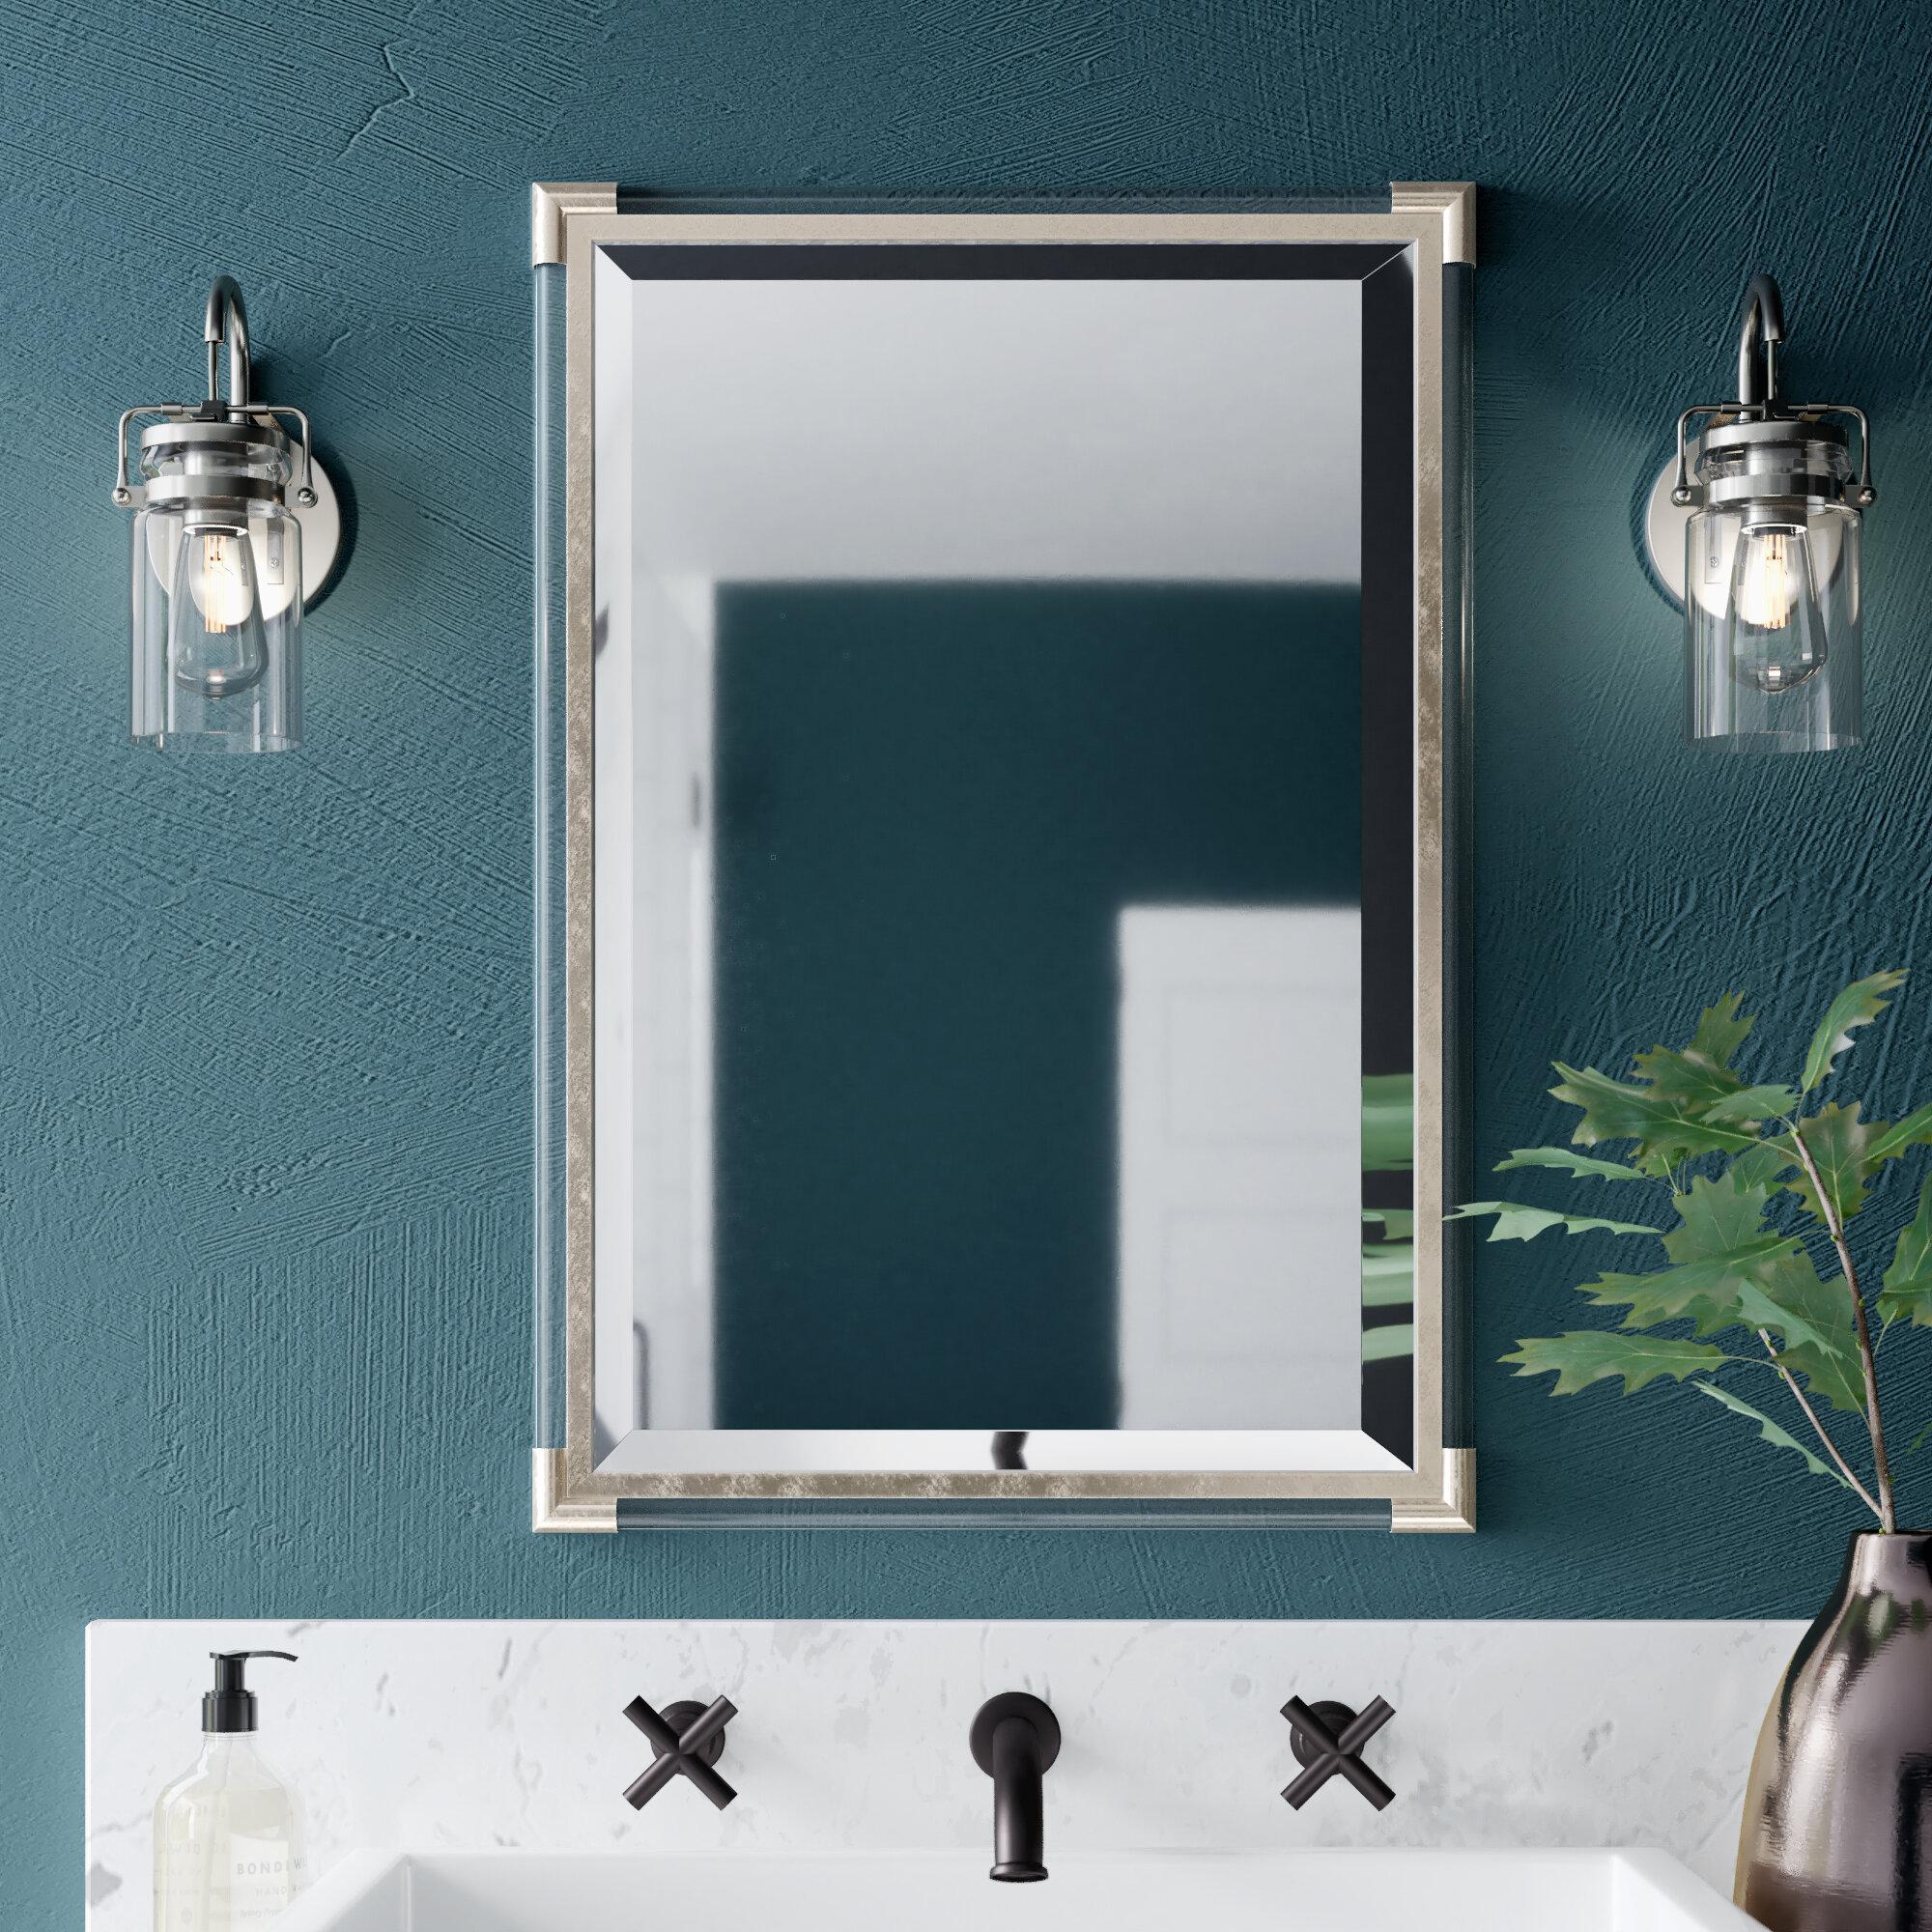 Marta Silver Frame Accent Wall Mirror